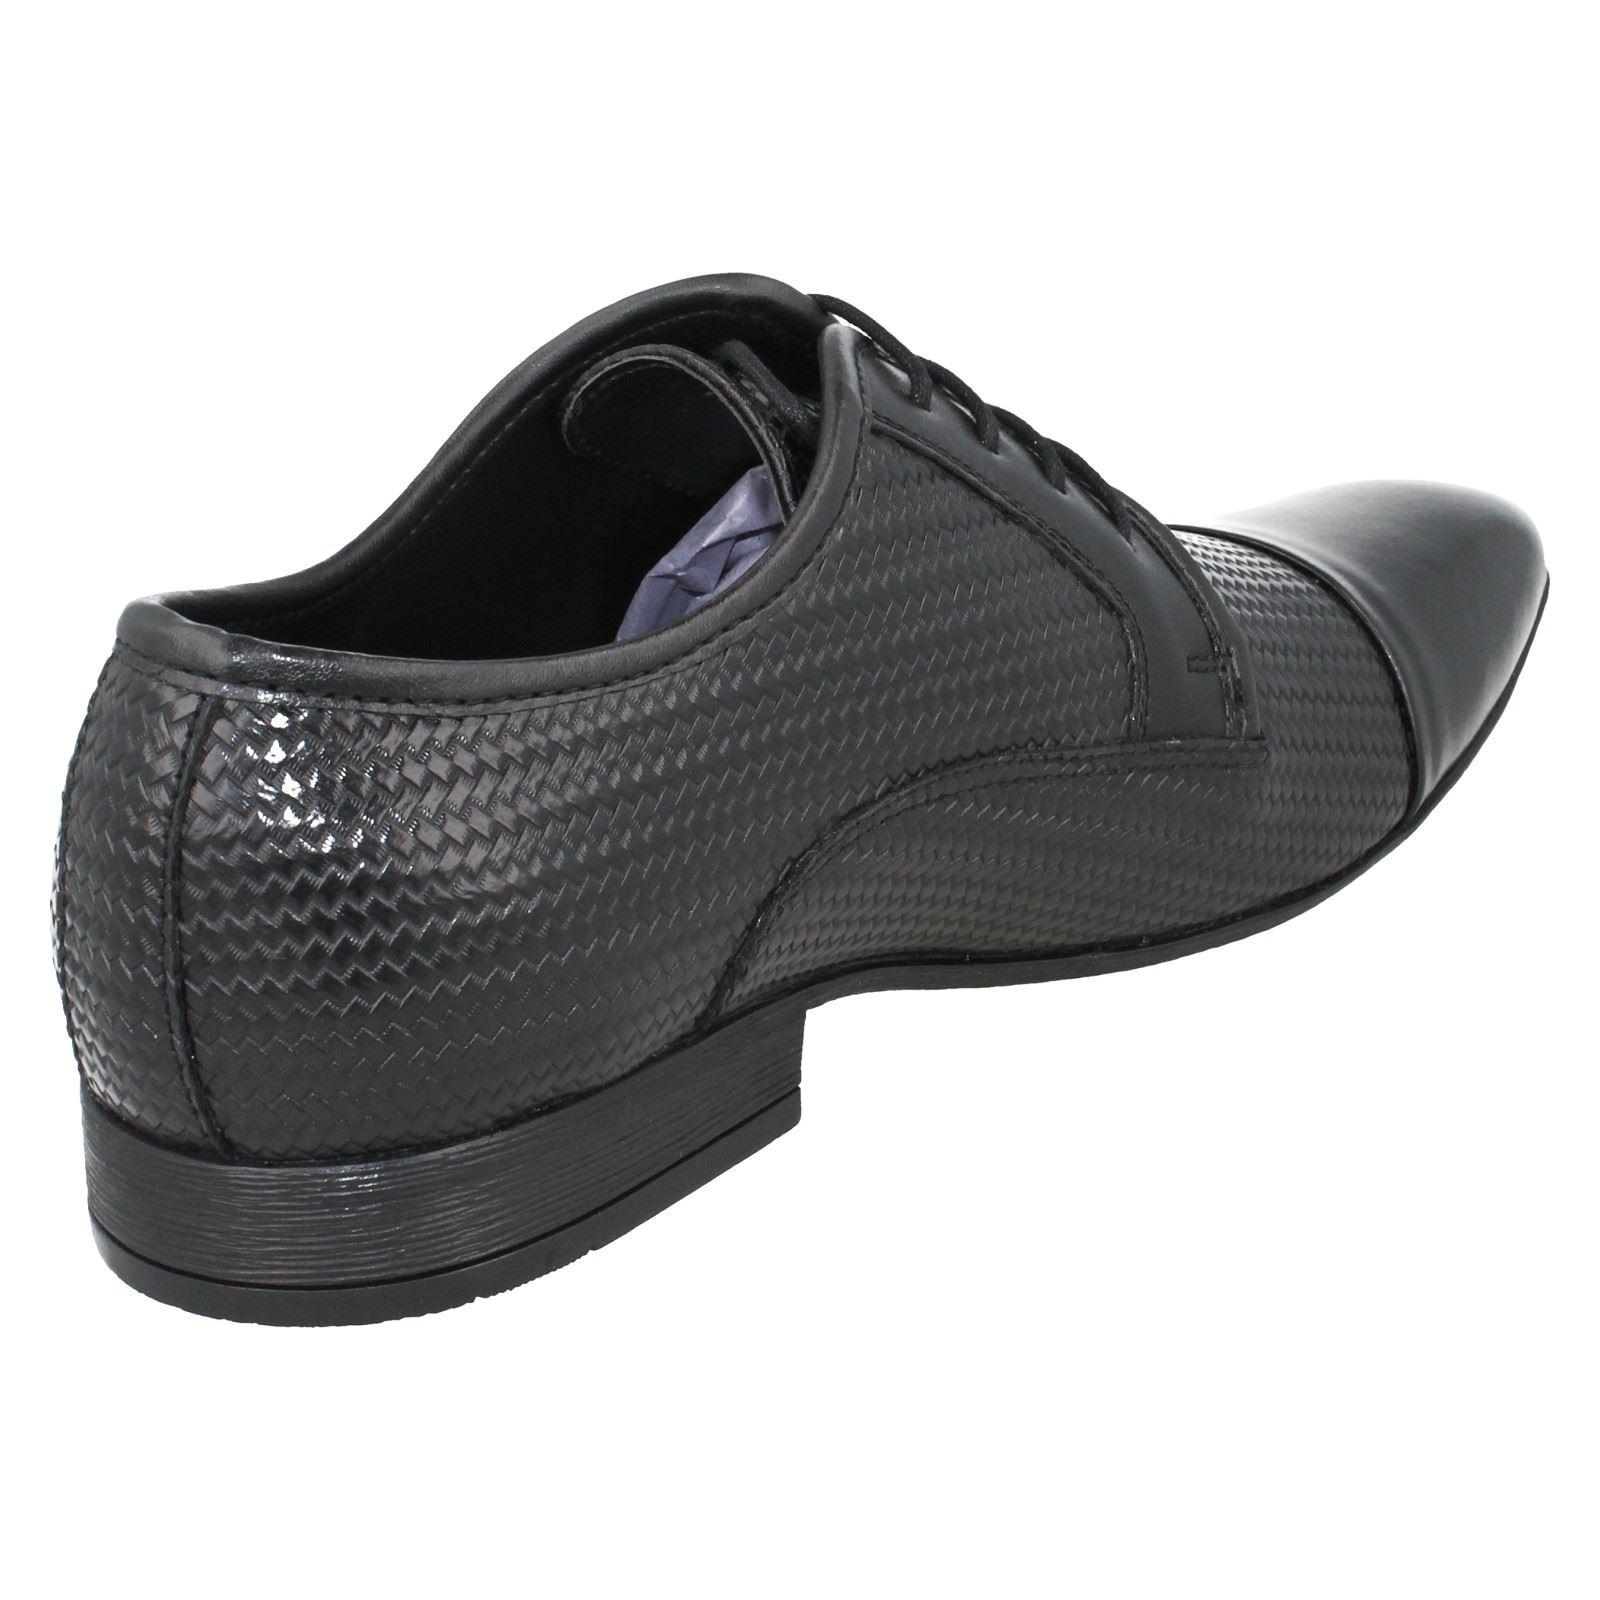 Mens Lambretta Plain Toe Weave Pattern Smart Shoes 21102